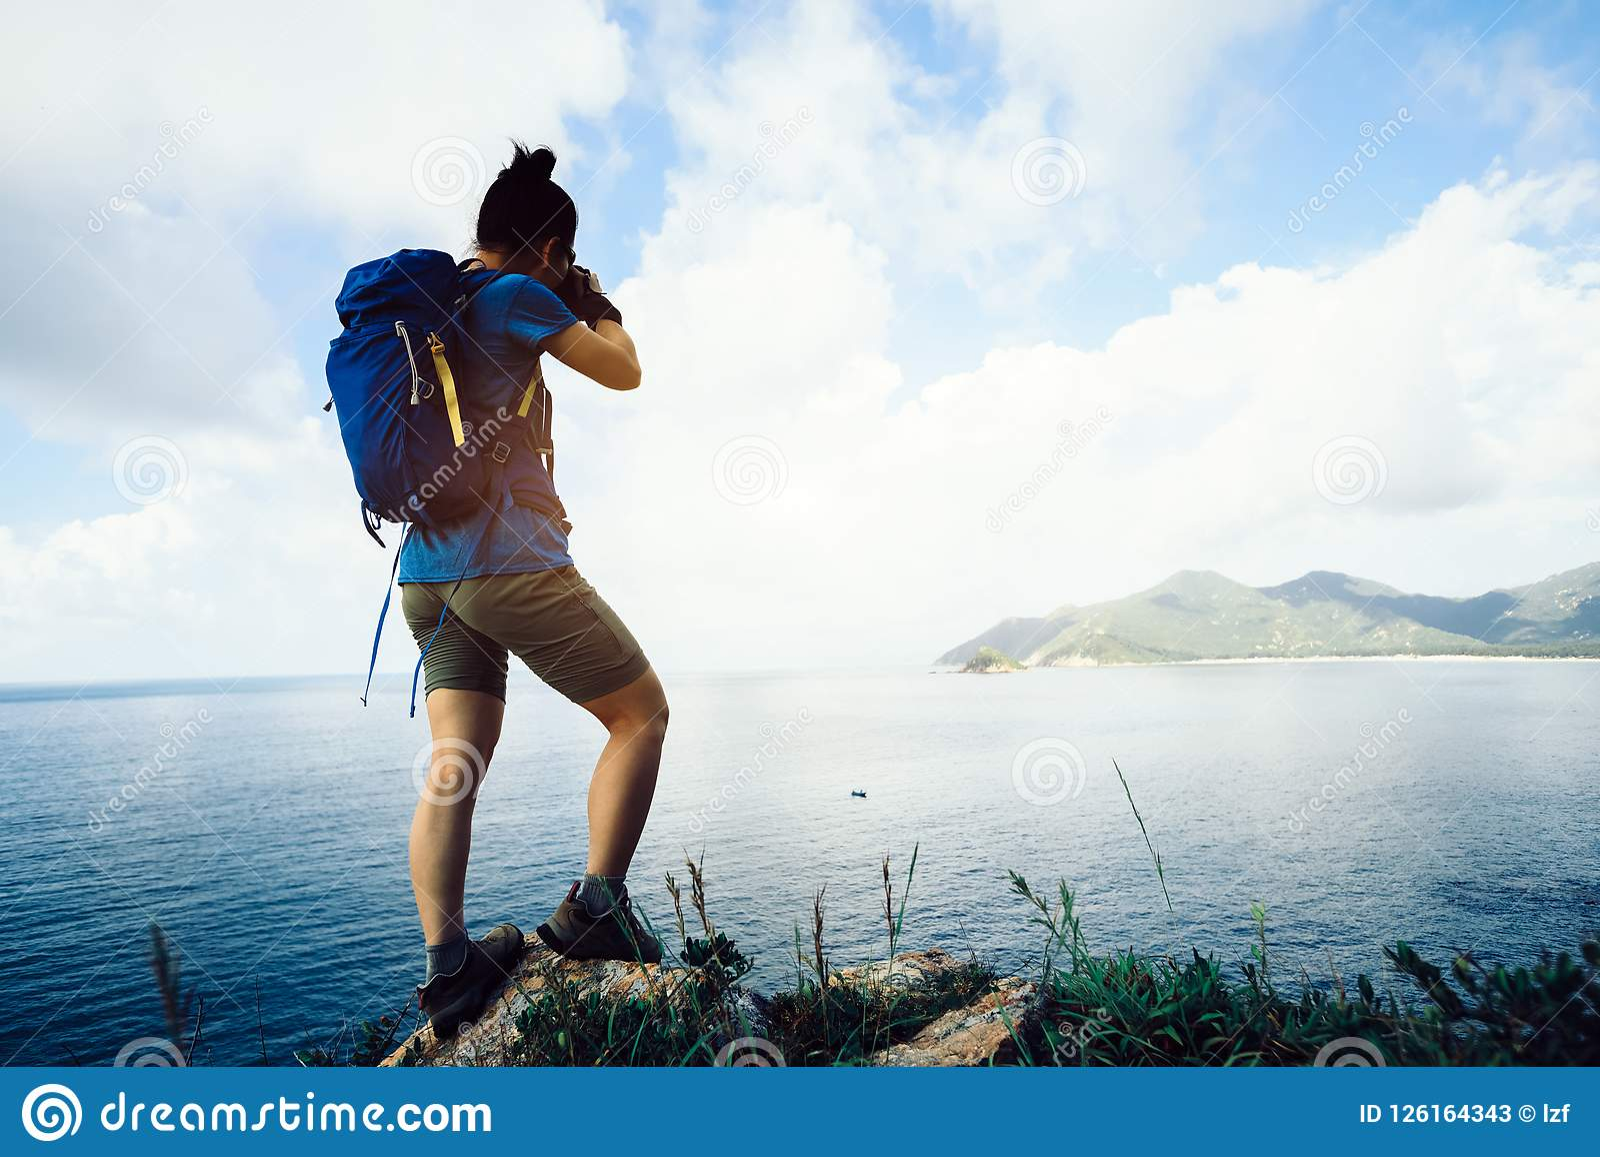 Photographe Hiking In Seaside prenant la photo avec la caméra